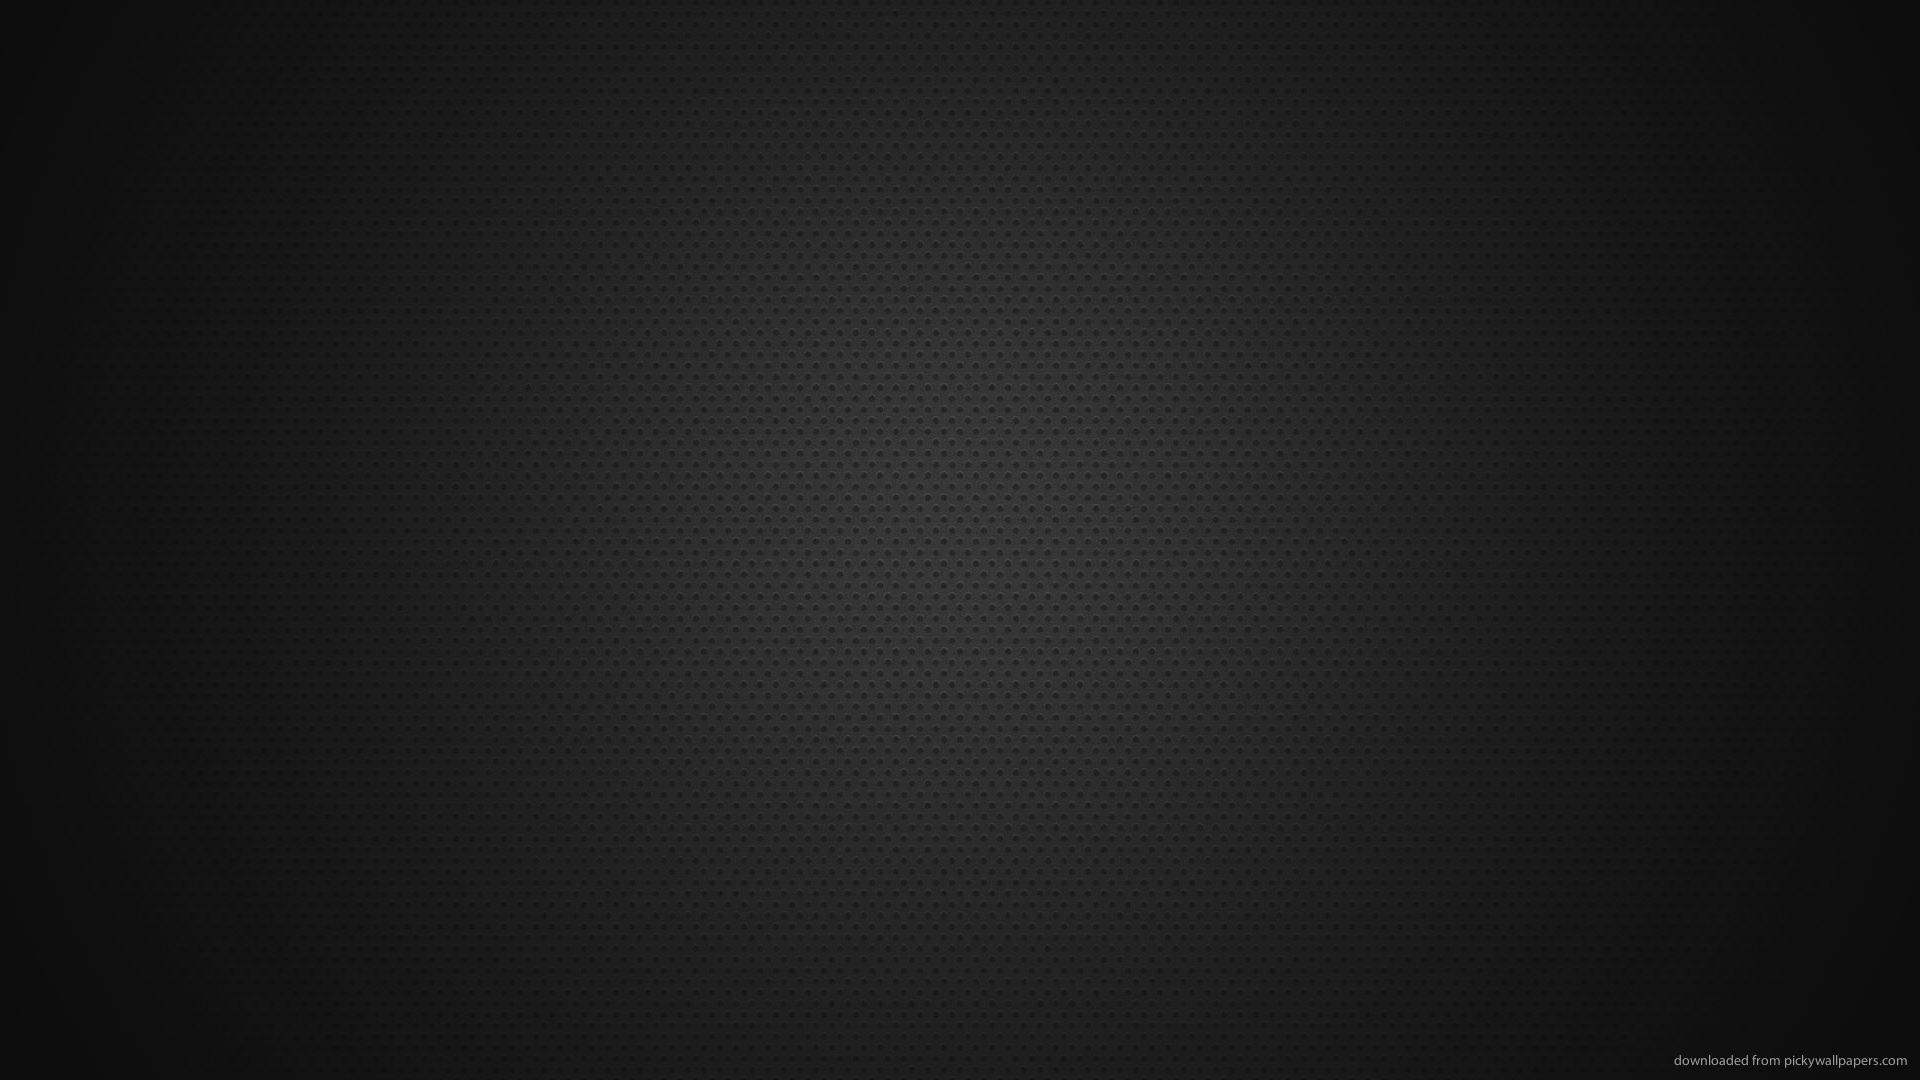 Minimal Wallpaper Iphone Black Wallpaper 1920x1080 8 Hd Wallpaper